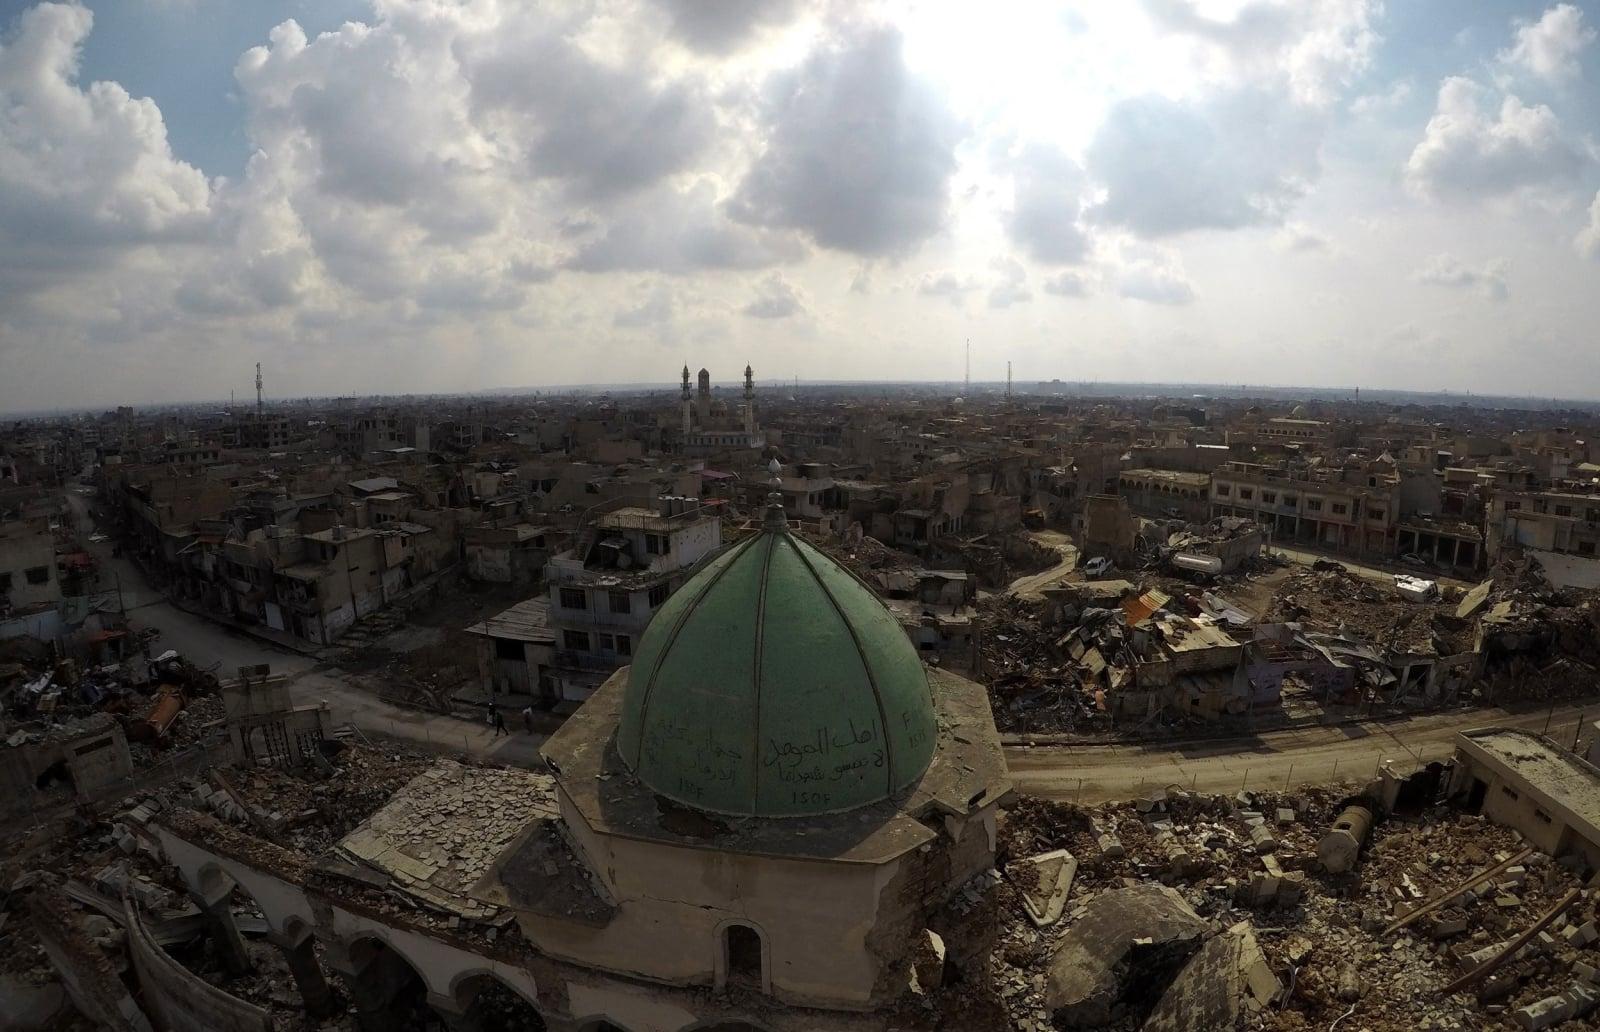 Krajobraz po bombardowaniu w Mosulu fot. EPA/MURTAJA LATEEF